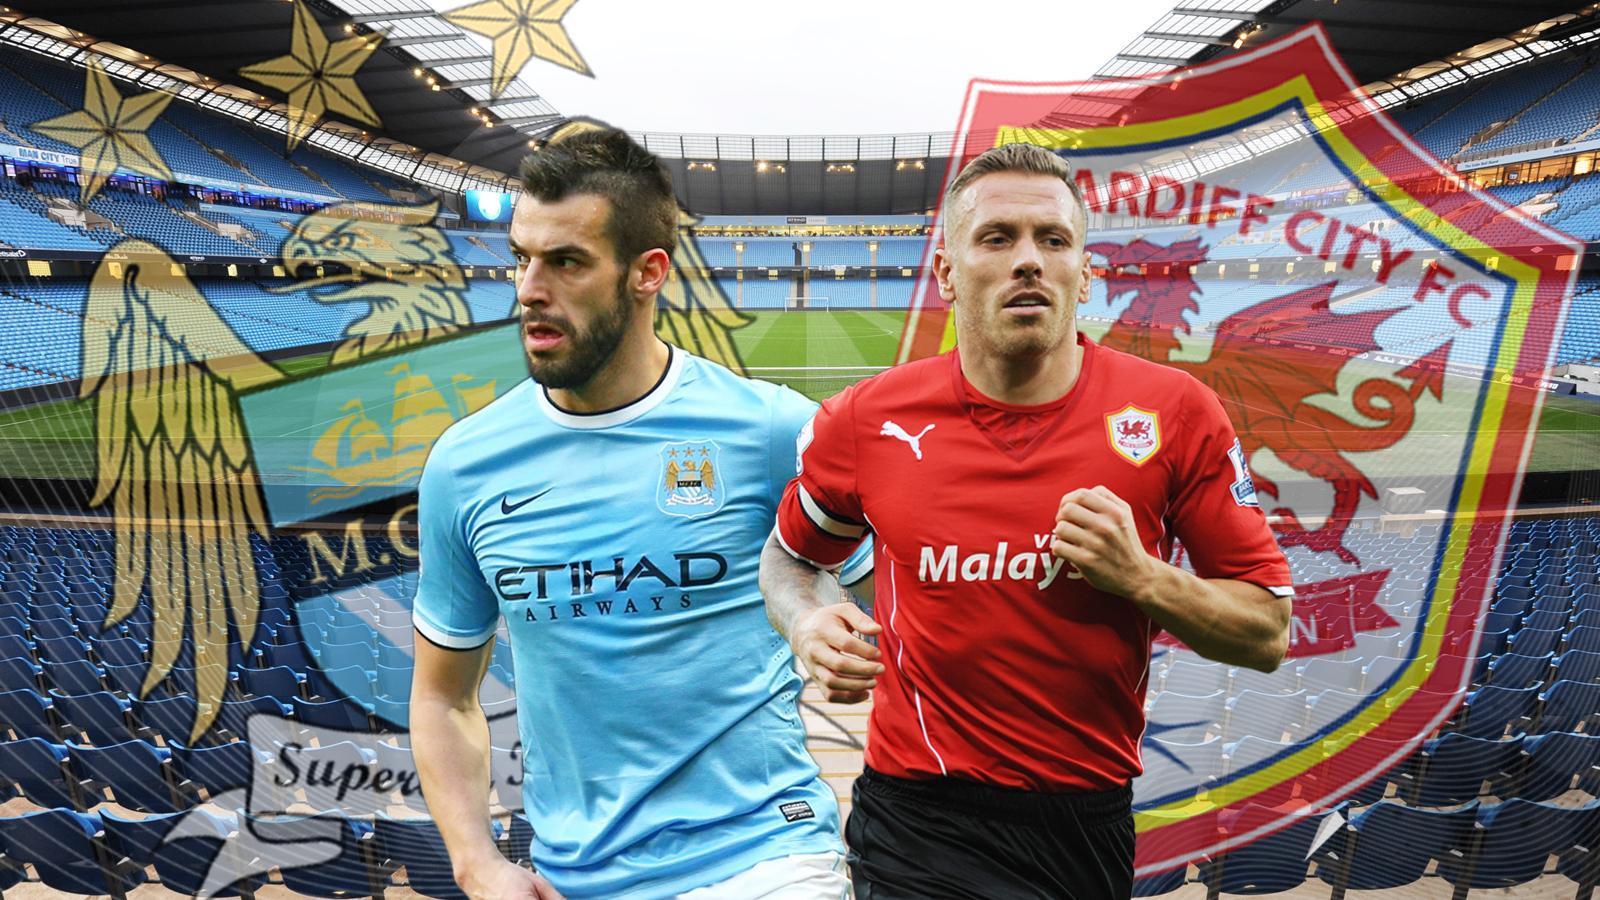 Прогноз на матч Манчестер Сити - Бернли 21 октября 2017